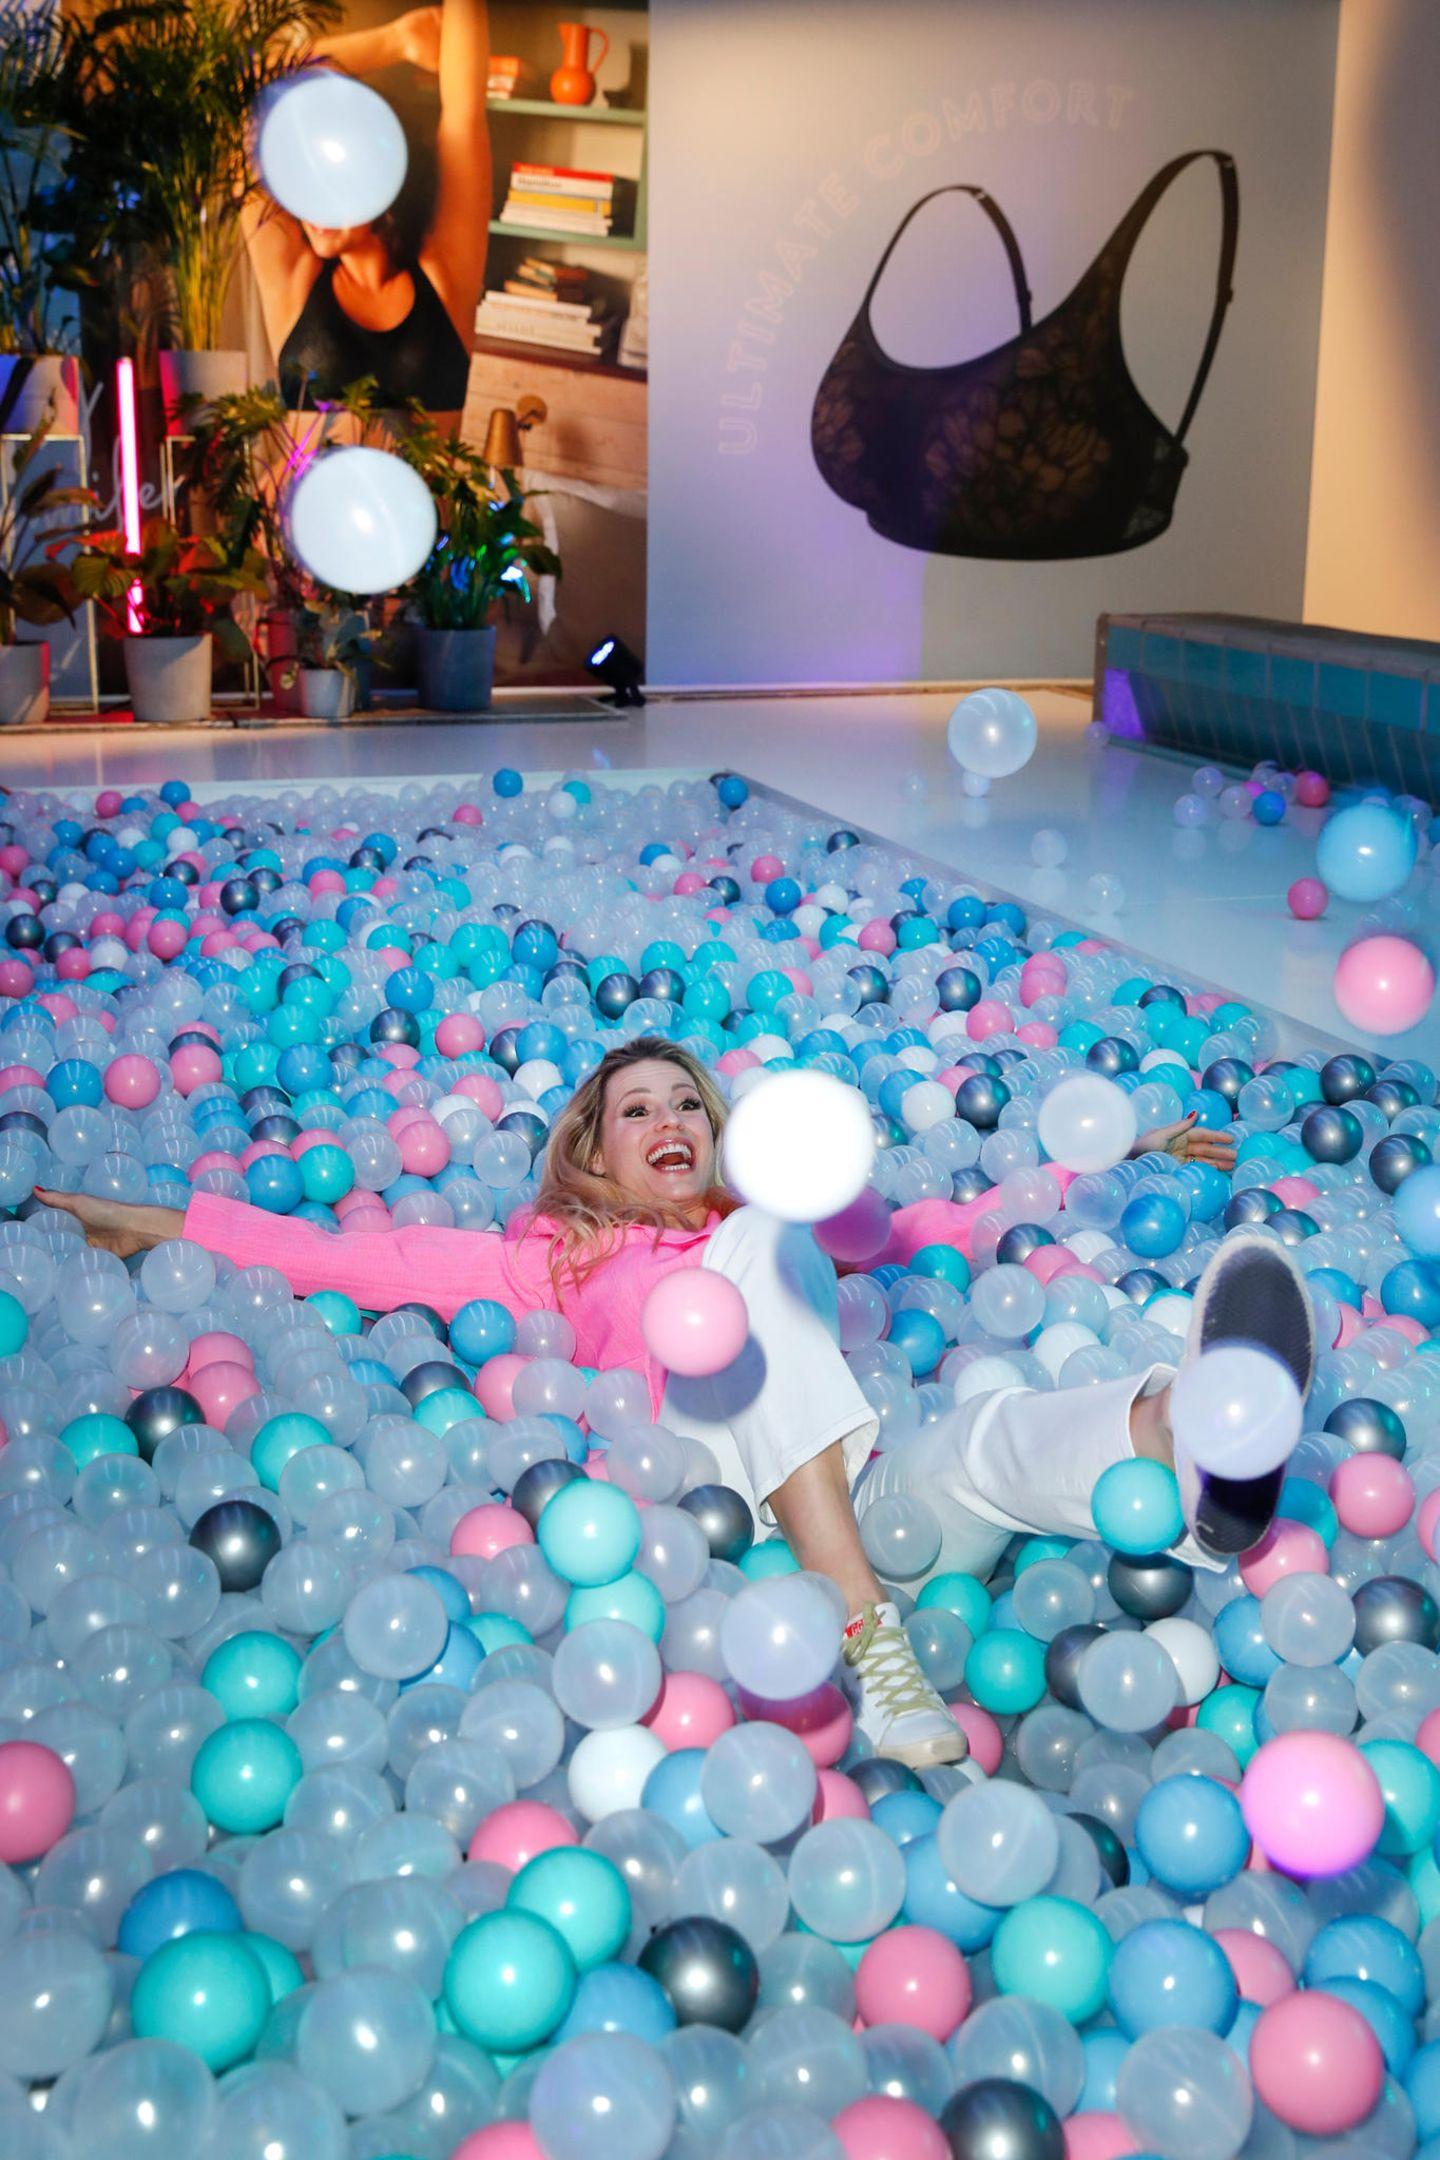 Promi-Events: Michelle Hunziker im Bällebad